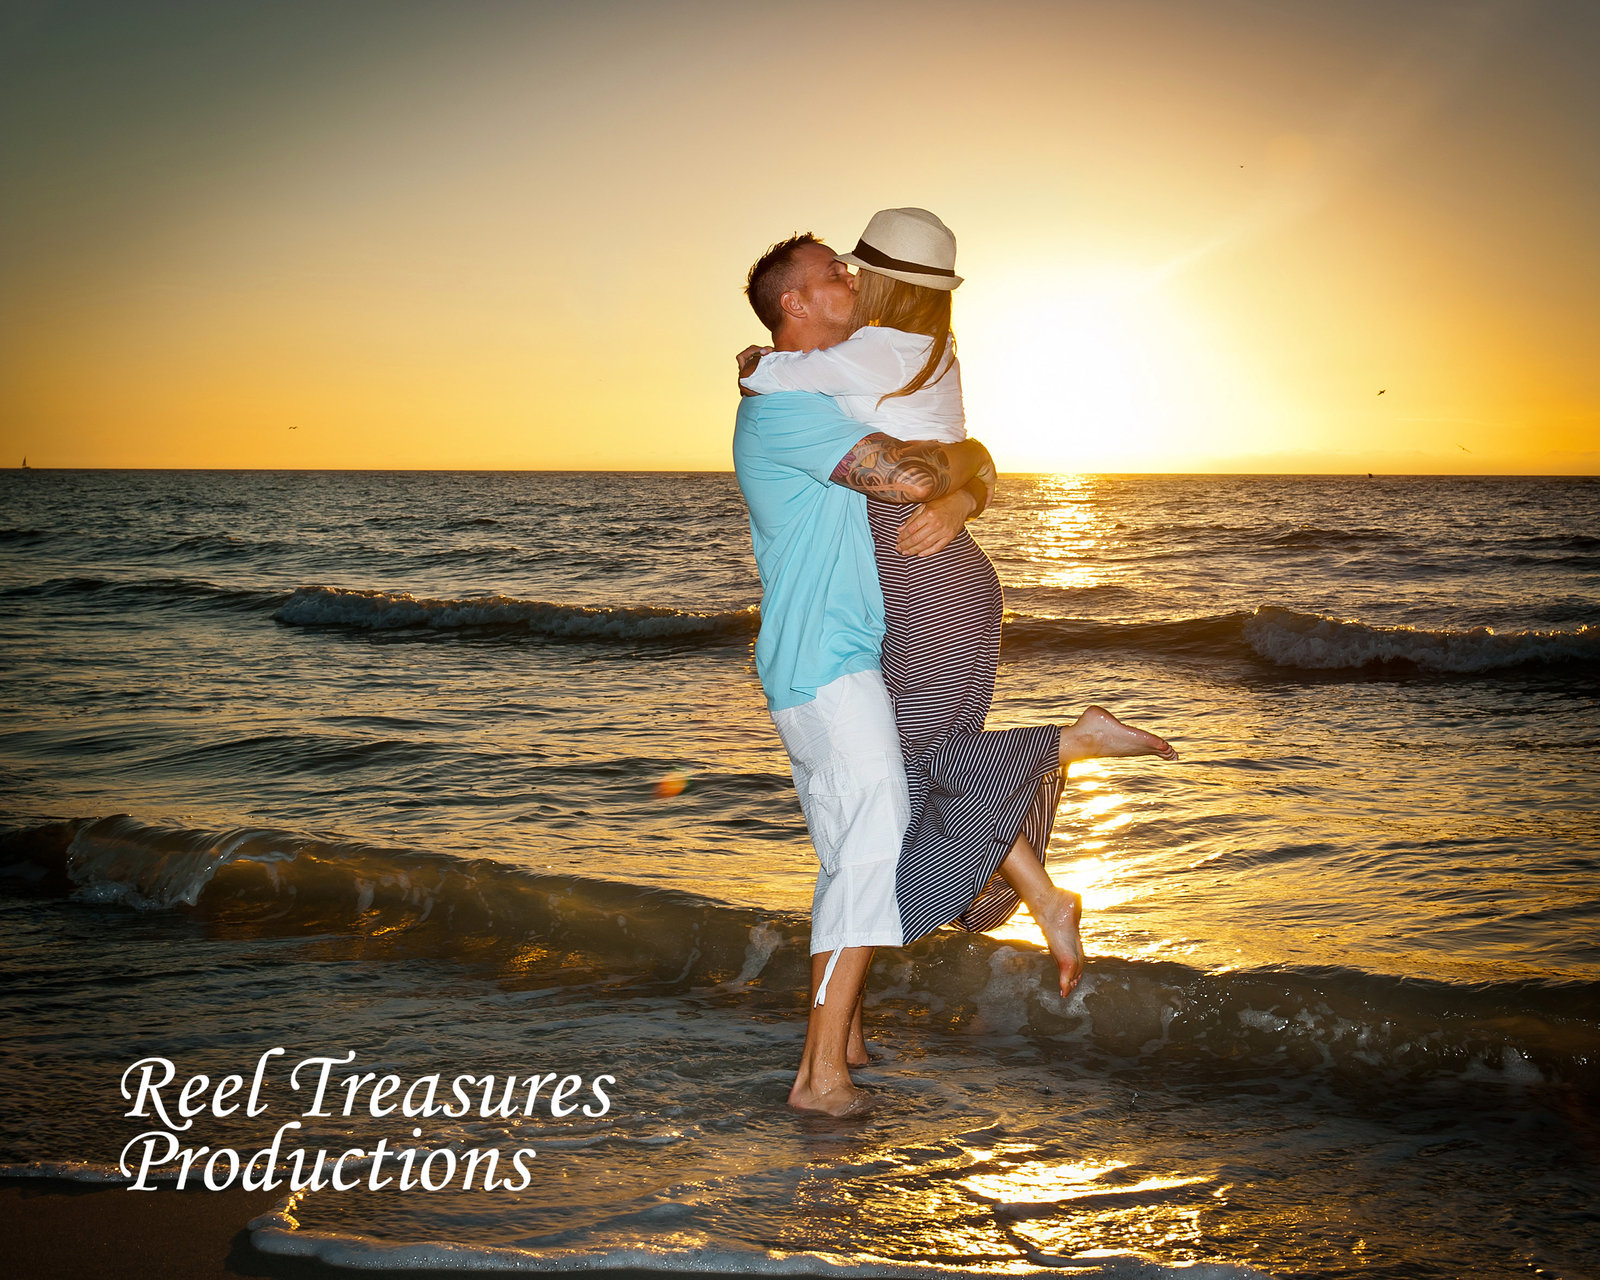 Reel Treasures Productions Engagement Shoot in Naples FL.